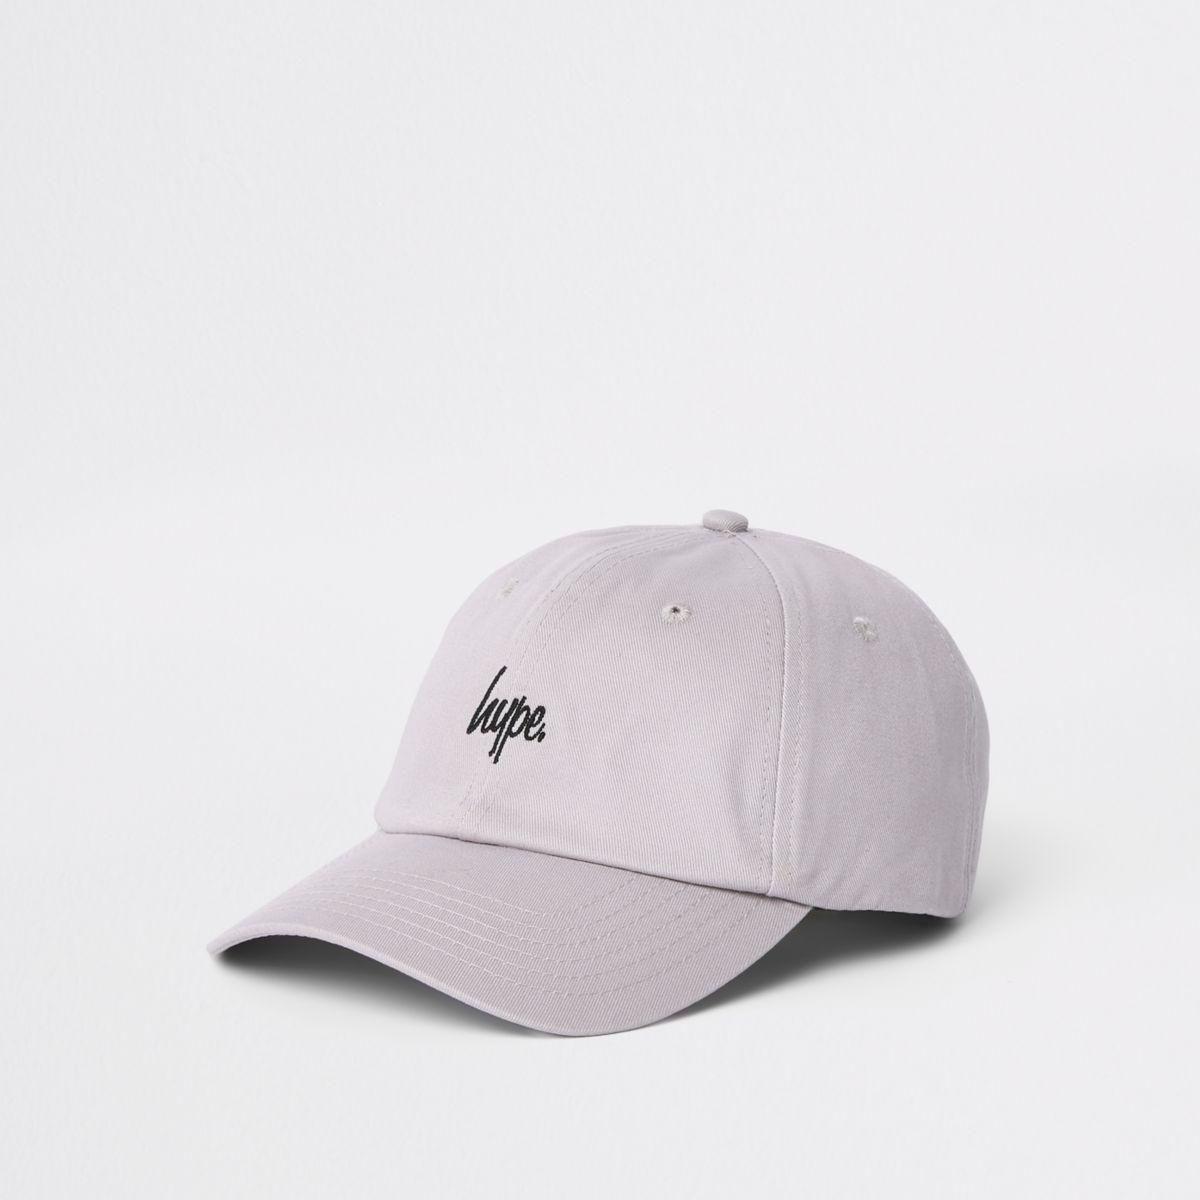 Hype grey baseball cap